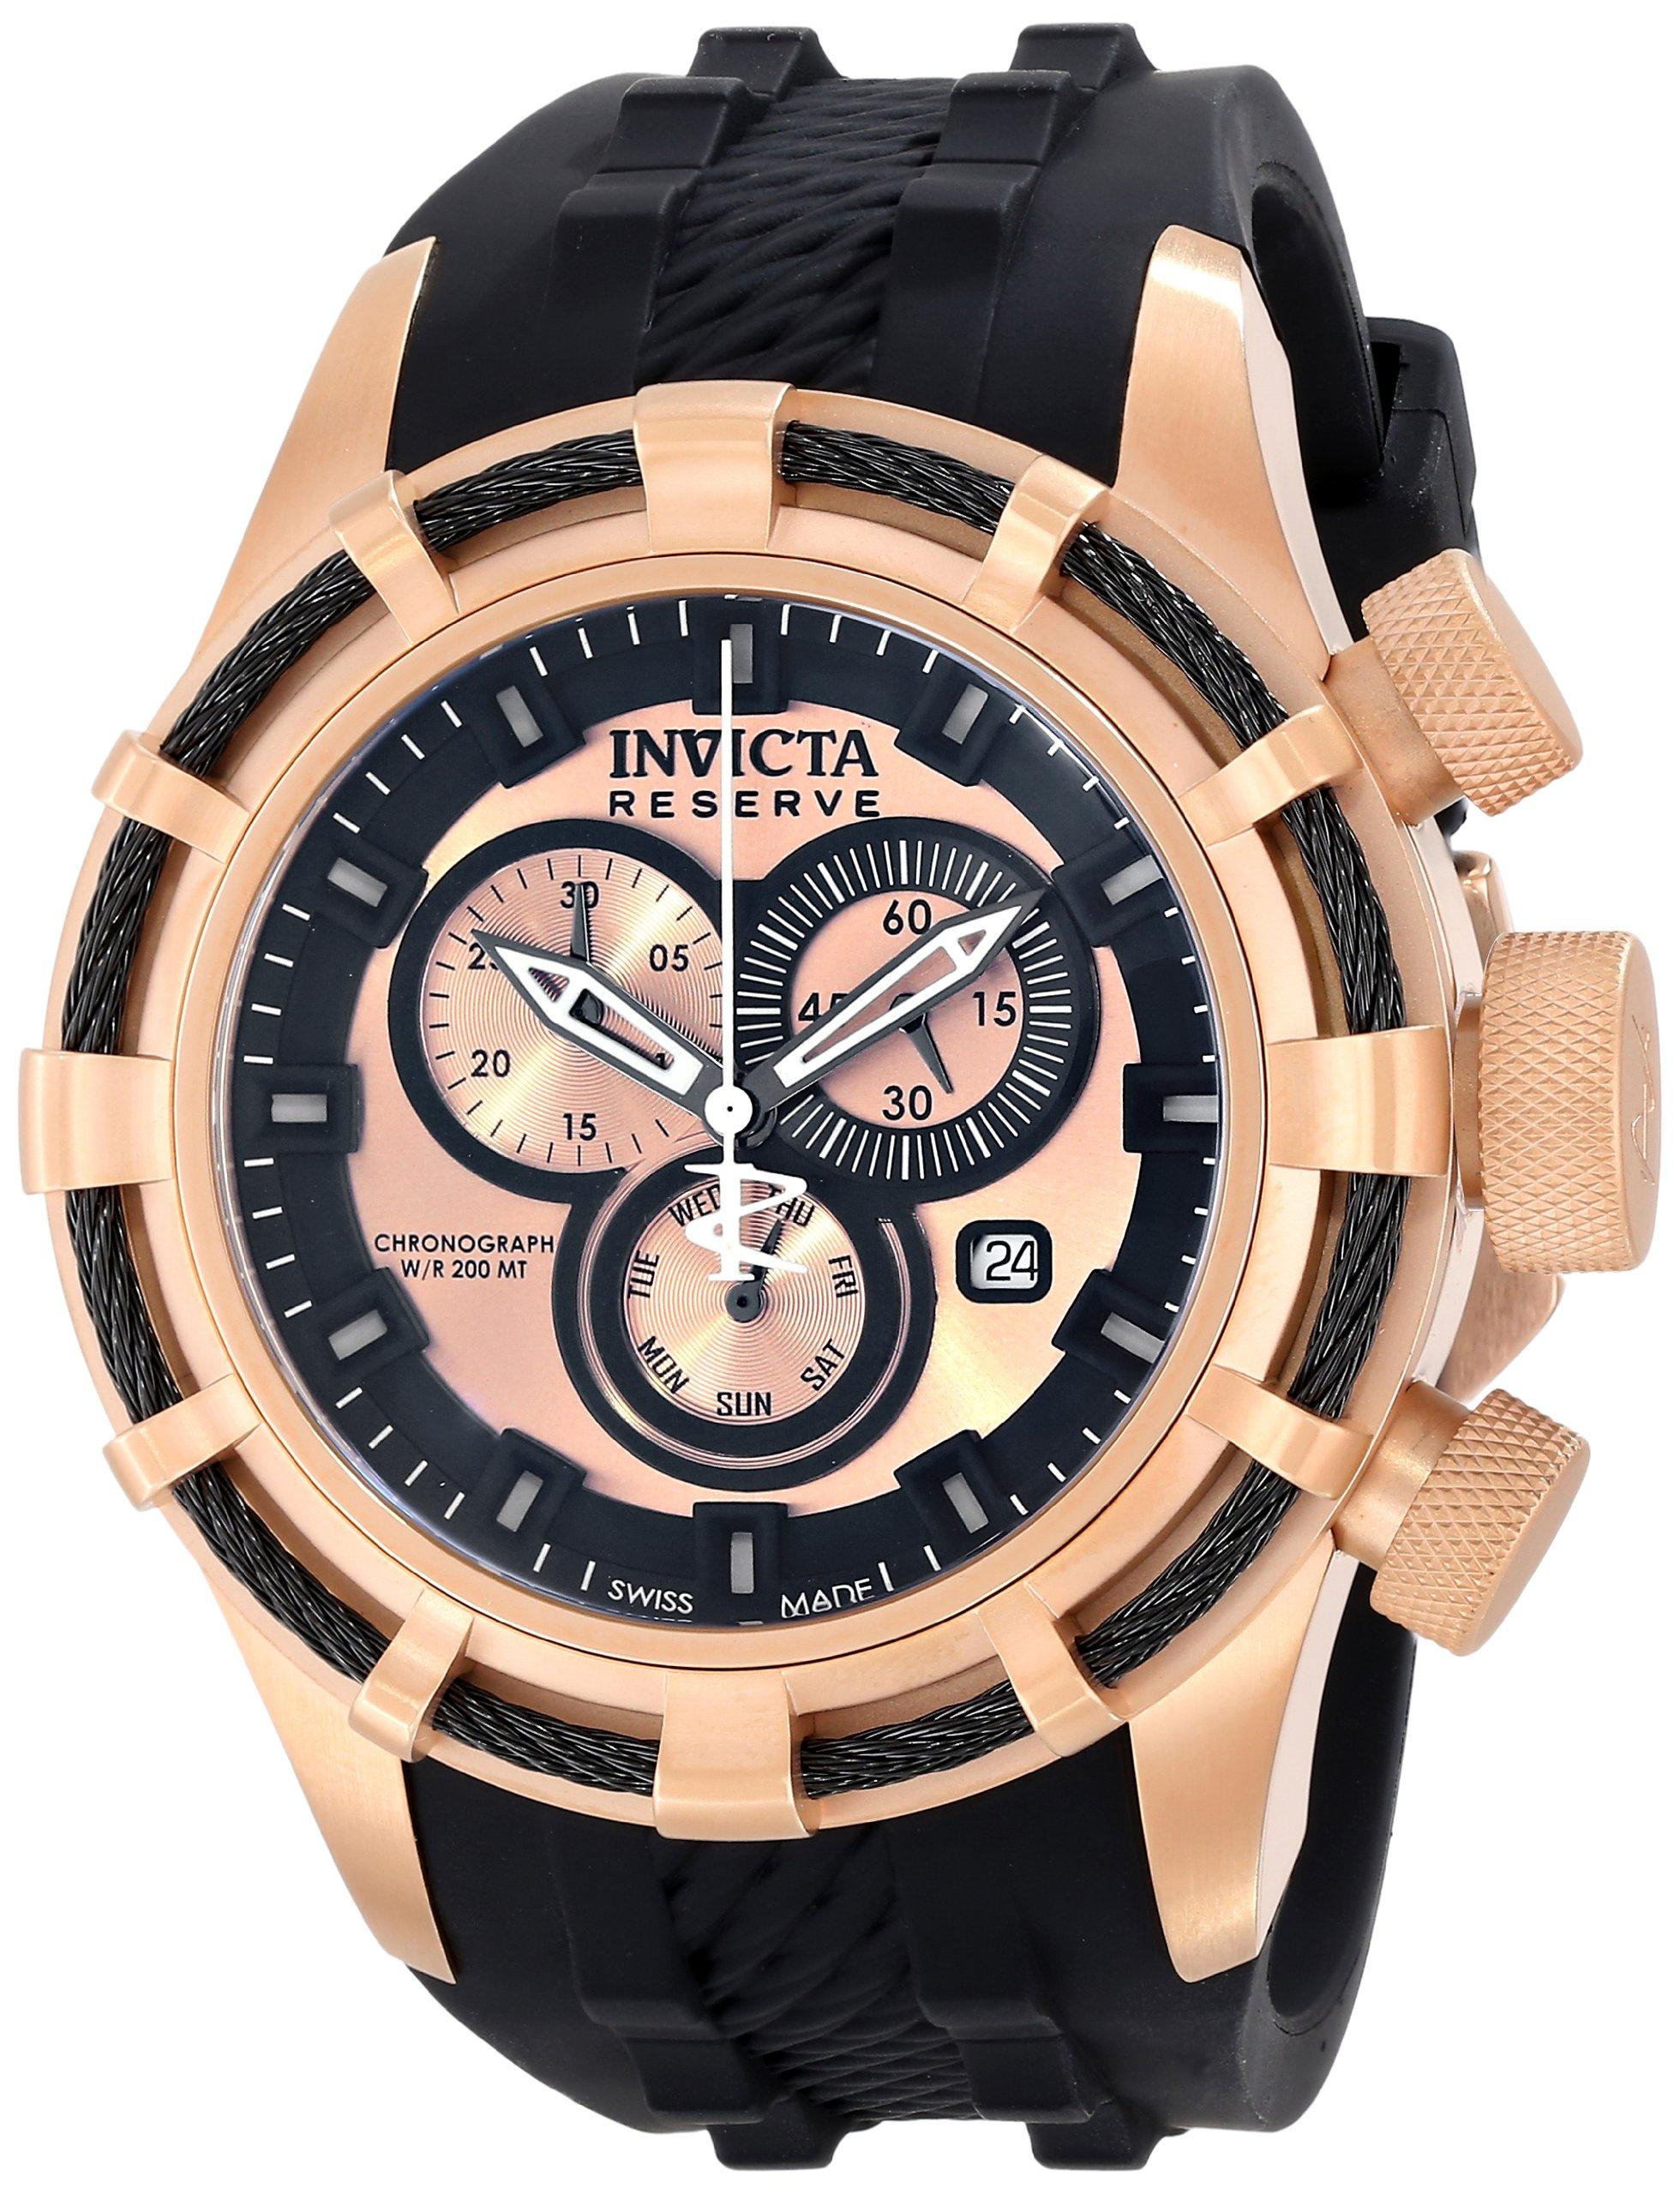 Invicta 15778 Swiss Quartz Men's Watch